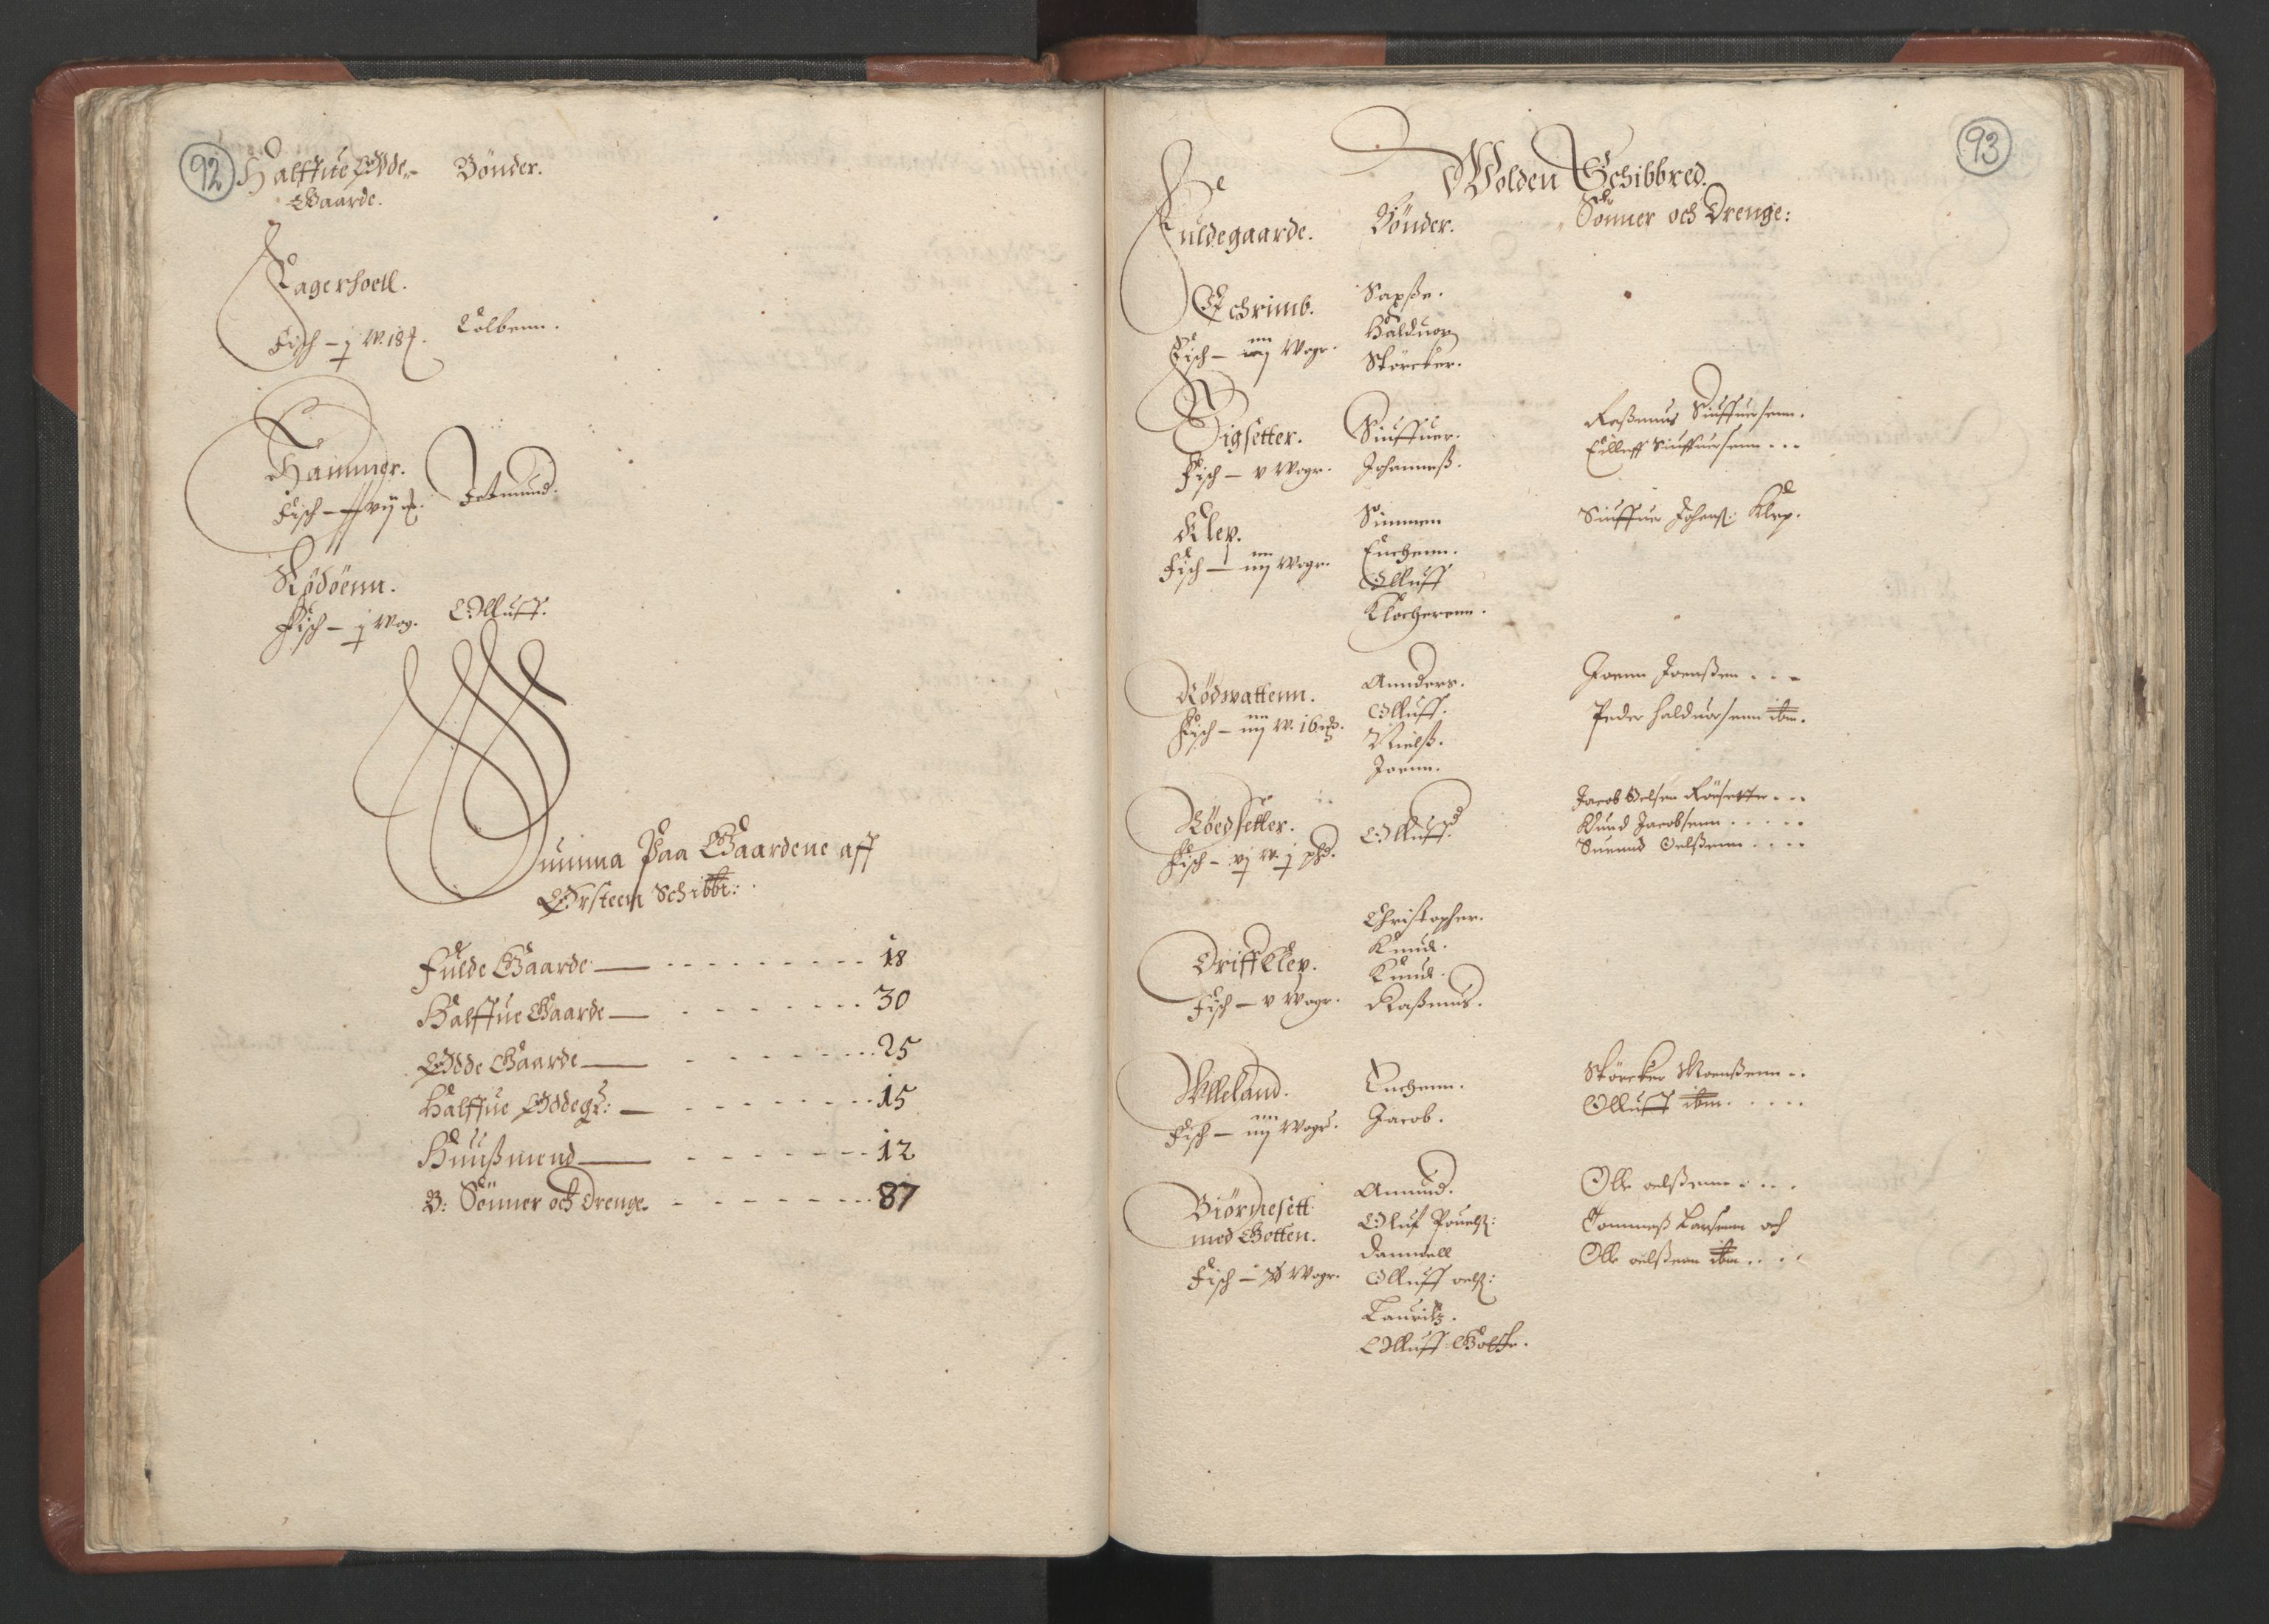 RA, Fogdenes og sorenskrivernes manntall 1664-1666, nr. 16: Romsdal fogderi og Sunnmøre fogderi, 1664-1665, s. 92-93